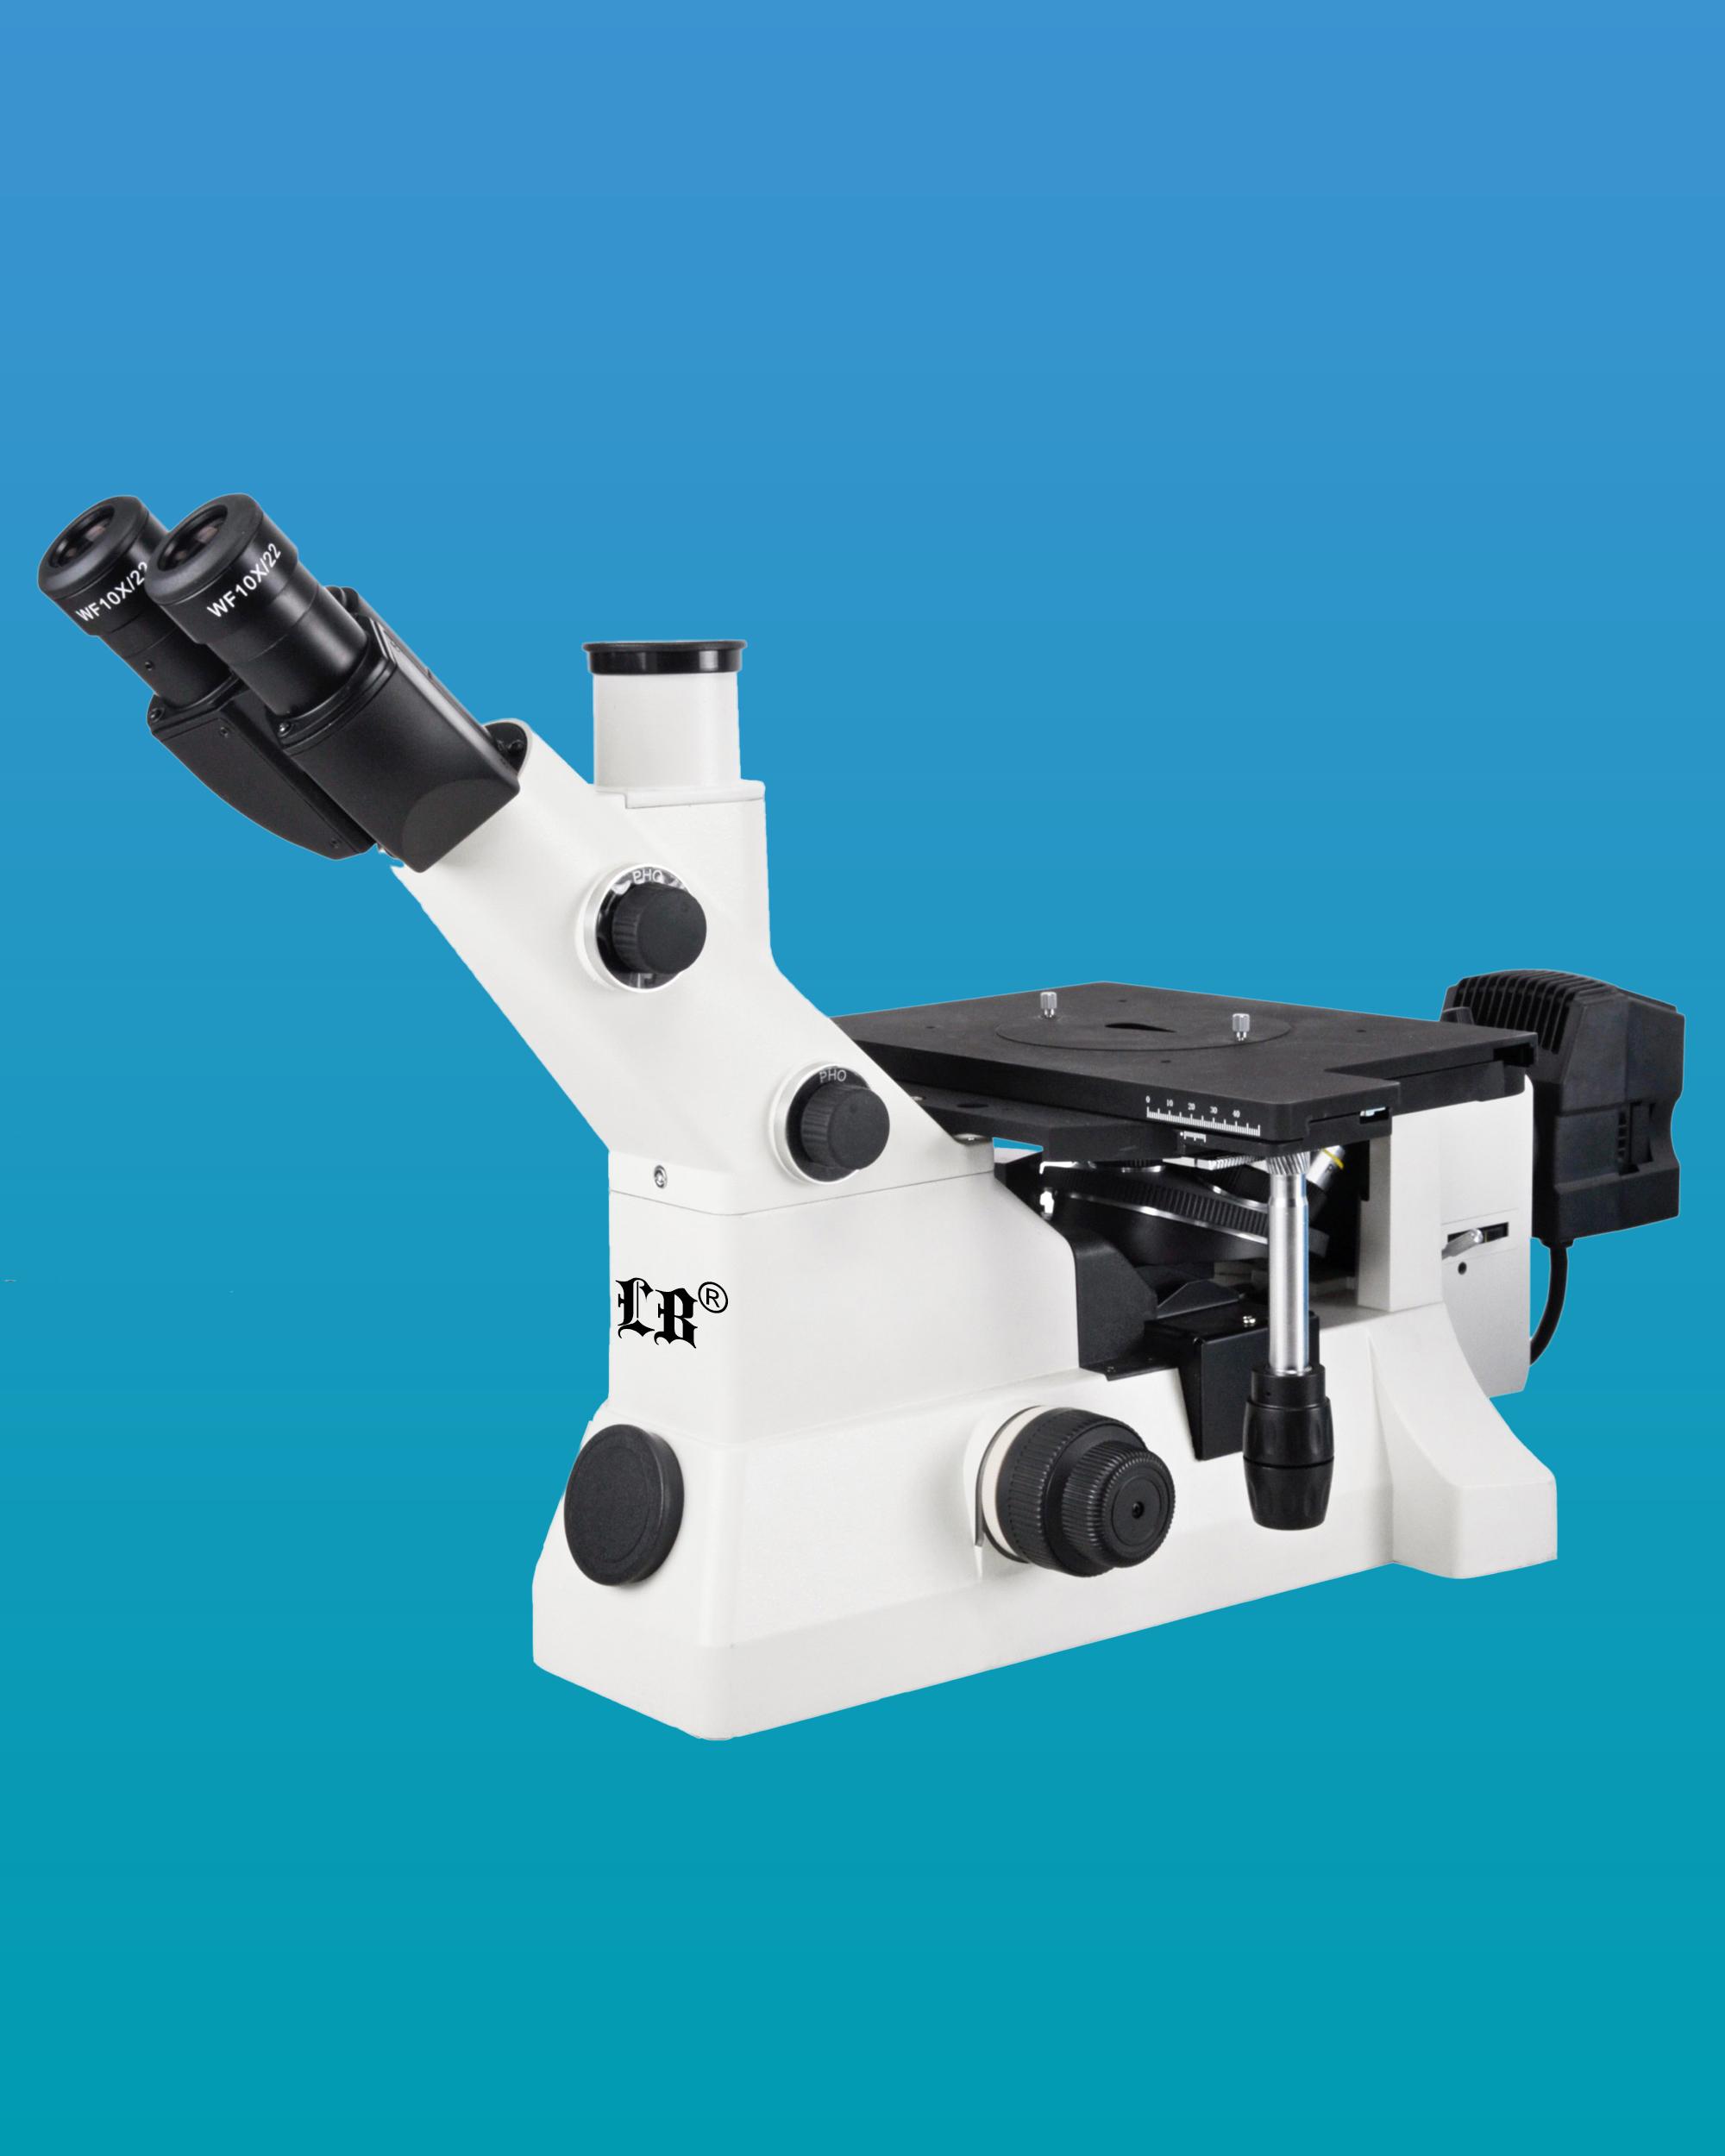 [LB-619] Inverted Trinocular Metallurgical Microscope w/ Infinite Plan Optical System, Extra Wide Field & Kohler Illumination